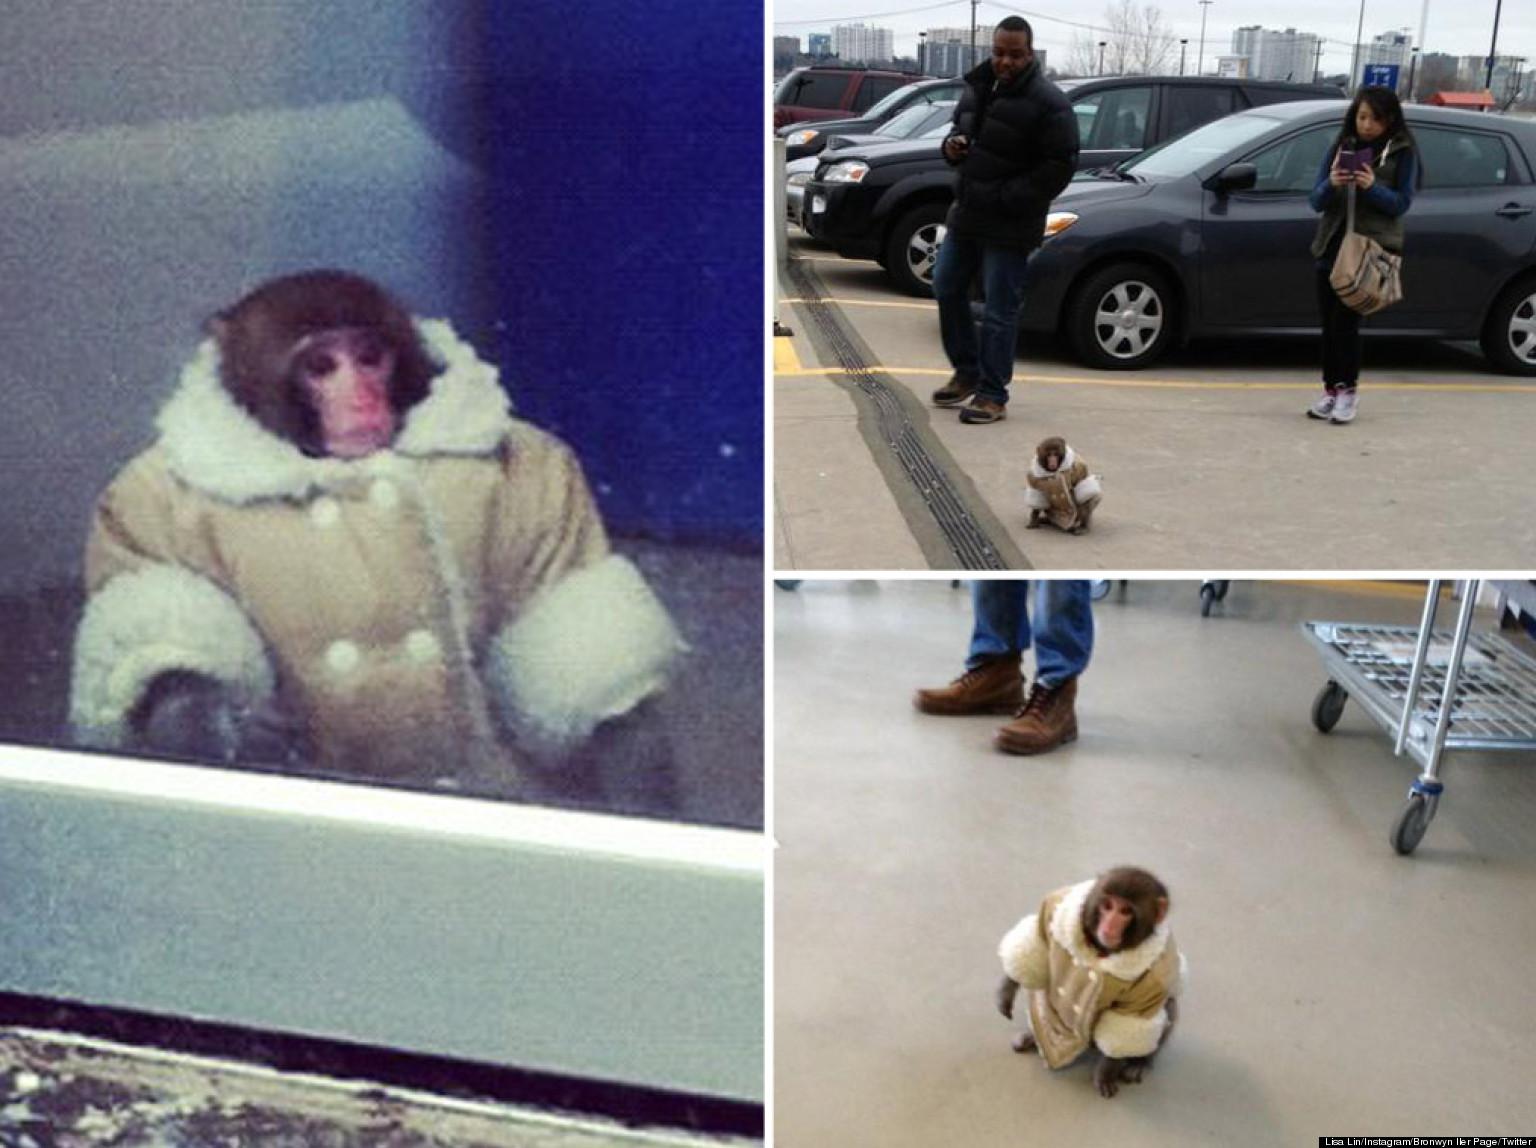 ikea monkey sent toronto animal sanctuary but owner